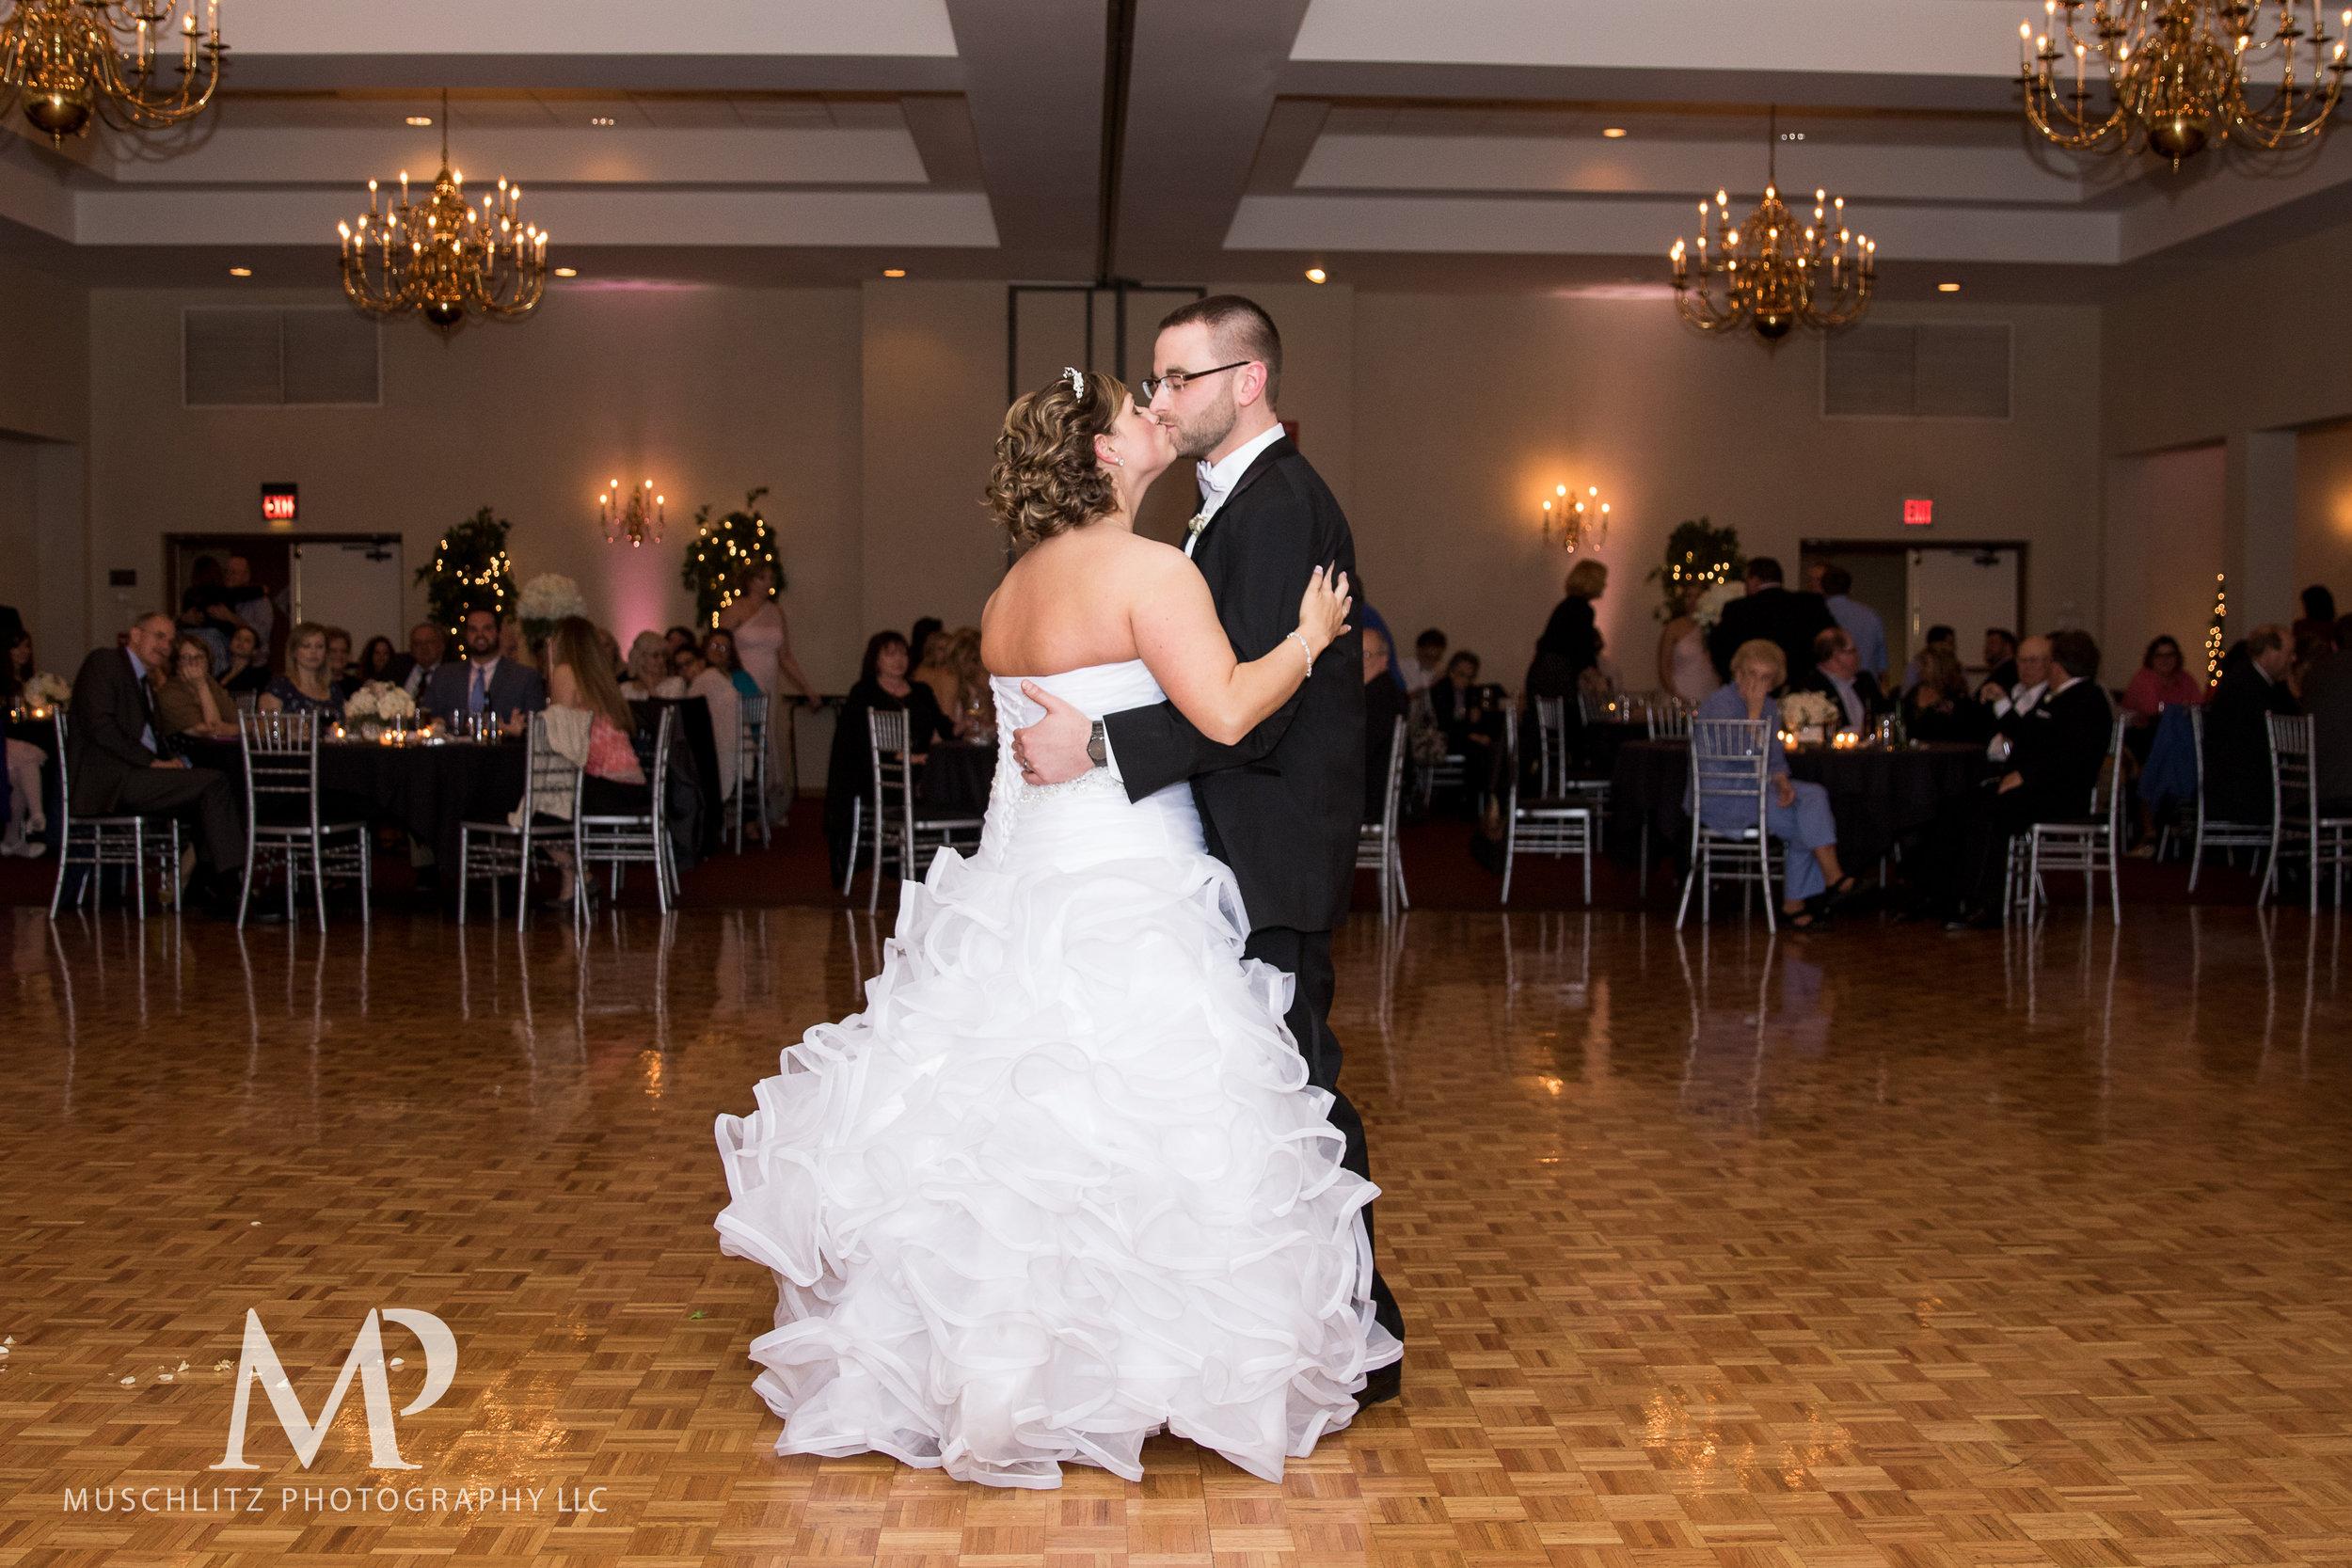 annunciation-banquet-conference-center-downtown-columbus-wedding-reception-downtown-columbus-ohio-muschlitz-photography-017.JPG